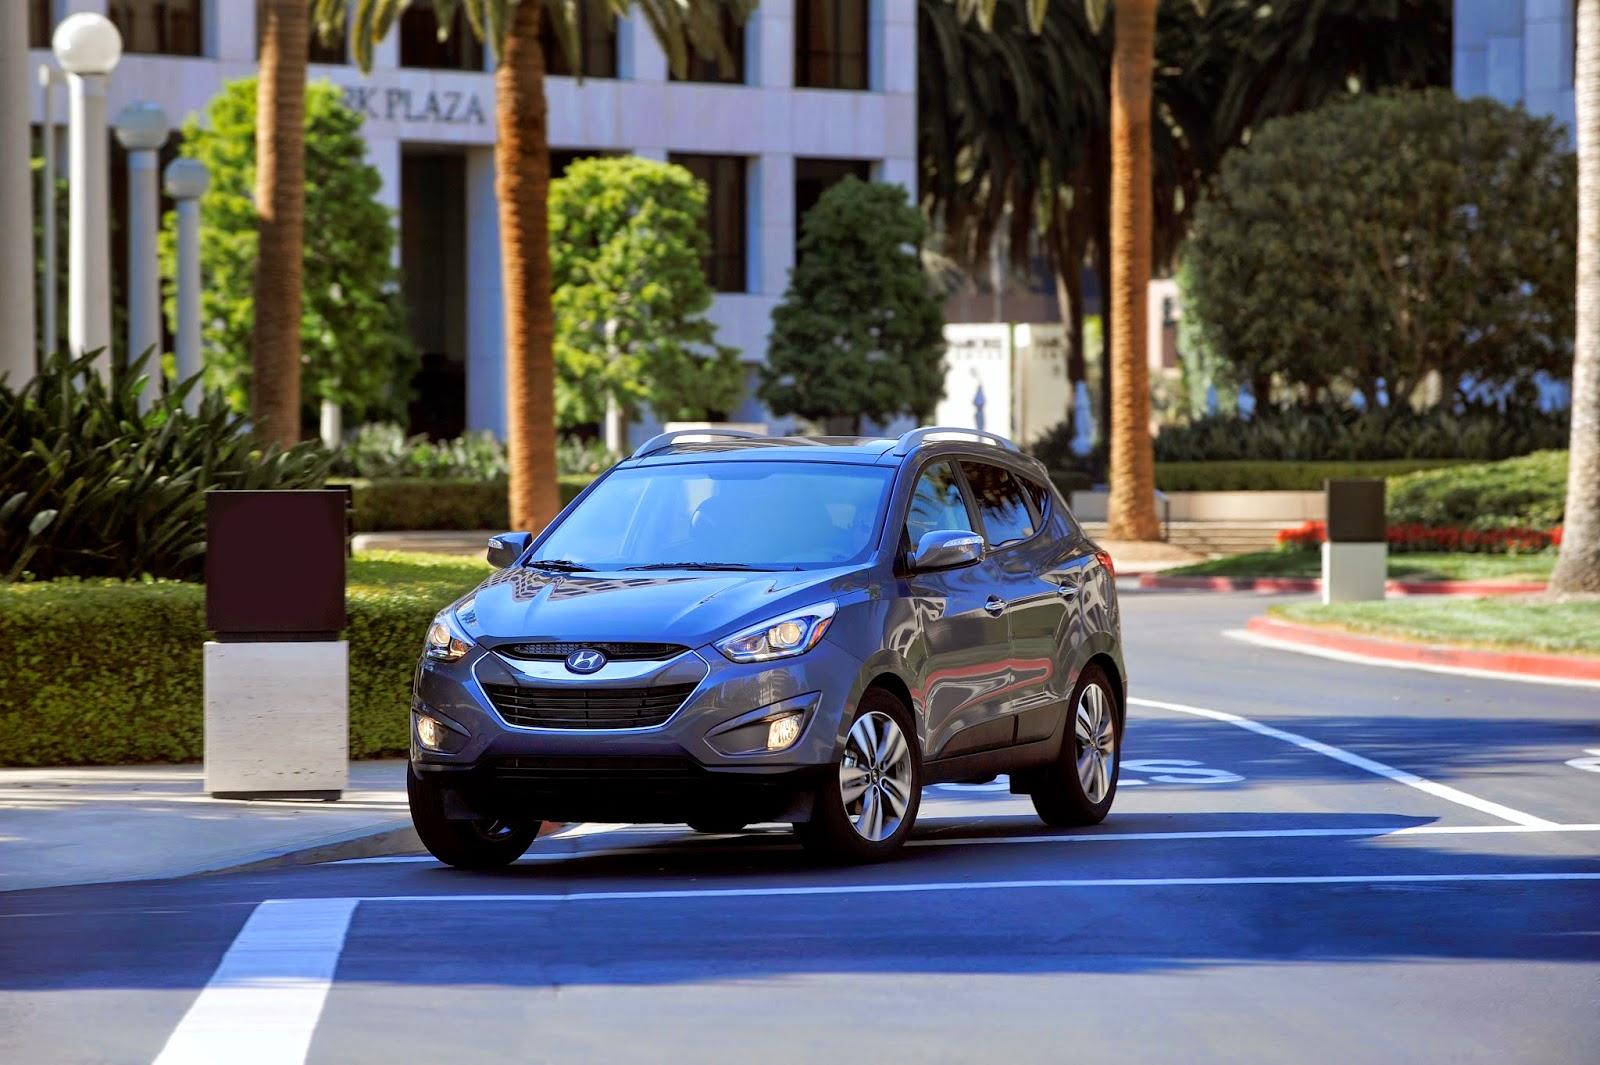 2014 Hyundai Tucson front 3/4 view